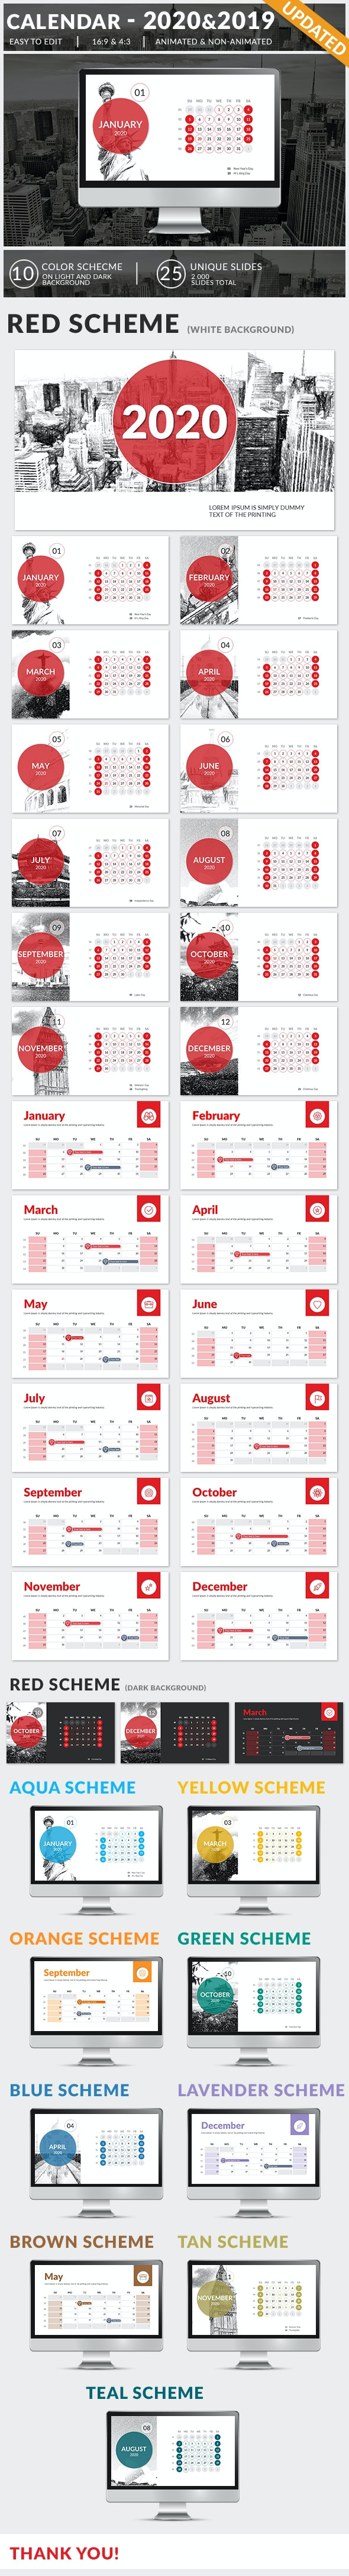 Calendar 2020 and 2019 PowerPoint Presentation Template - Business PowerPoint Templates